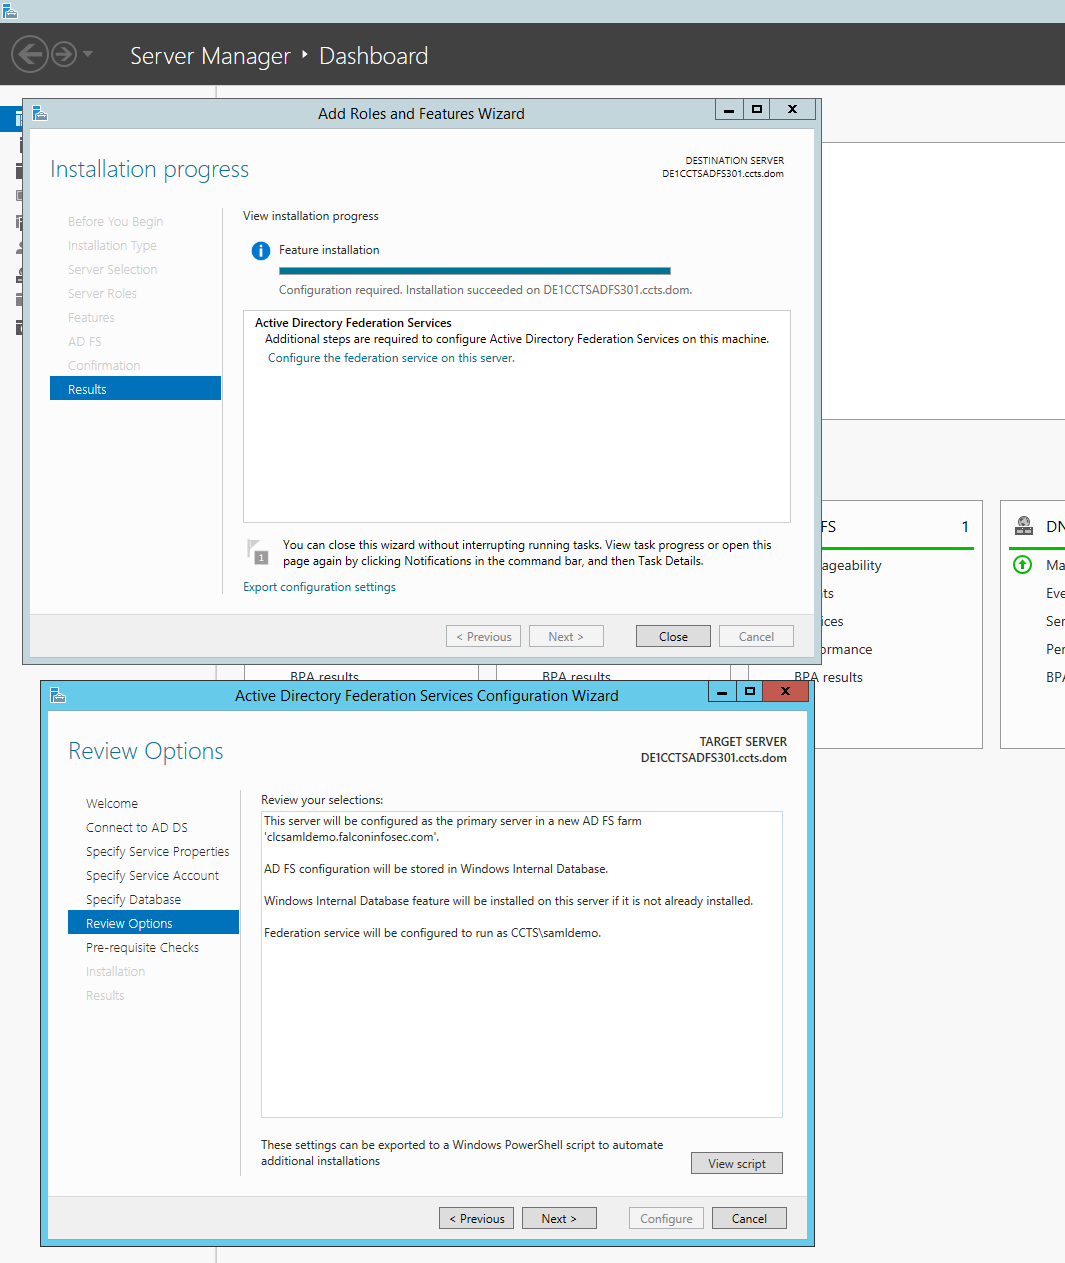 ADFS Configuration